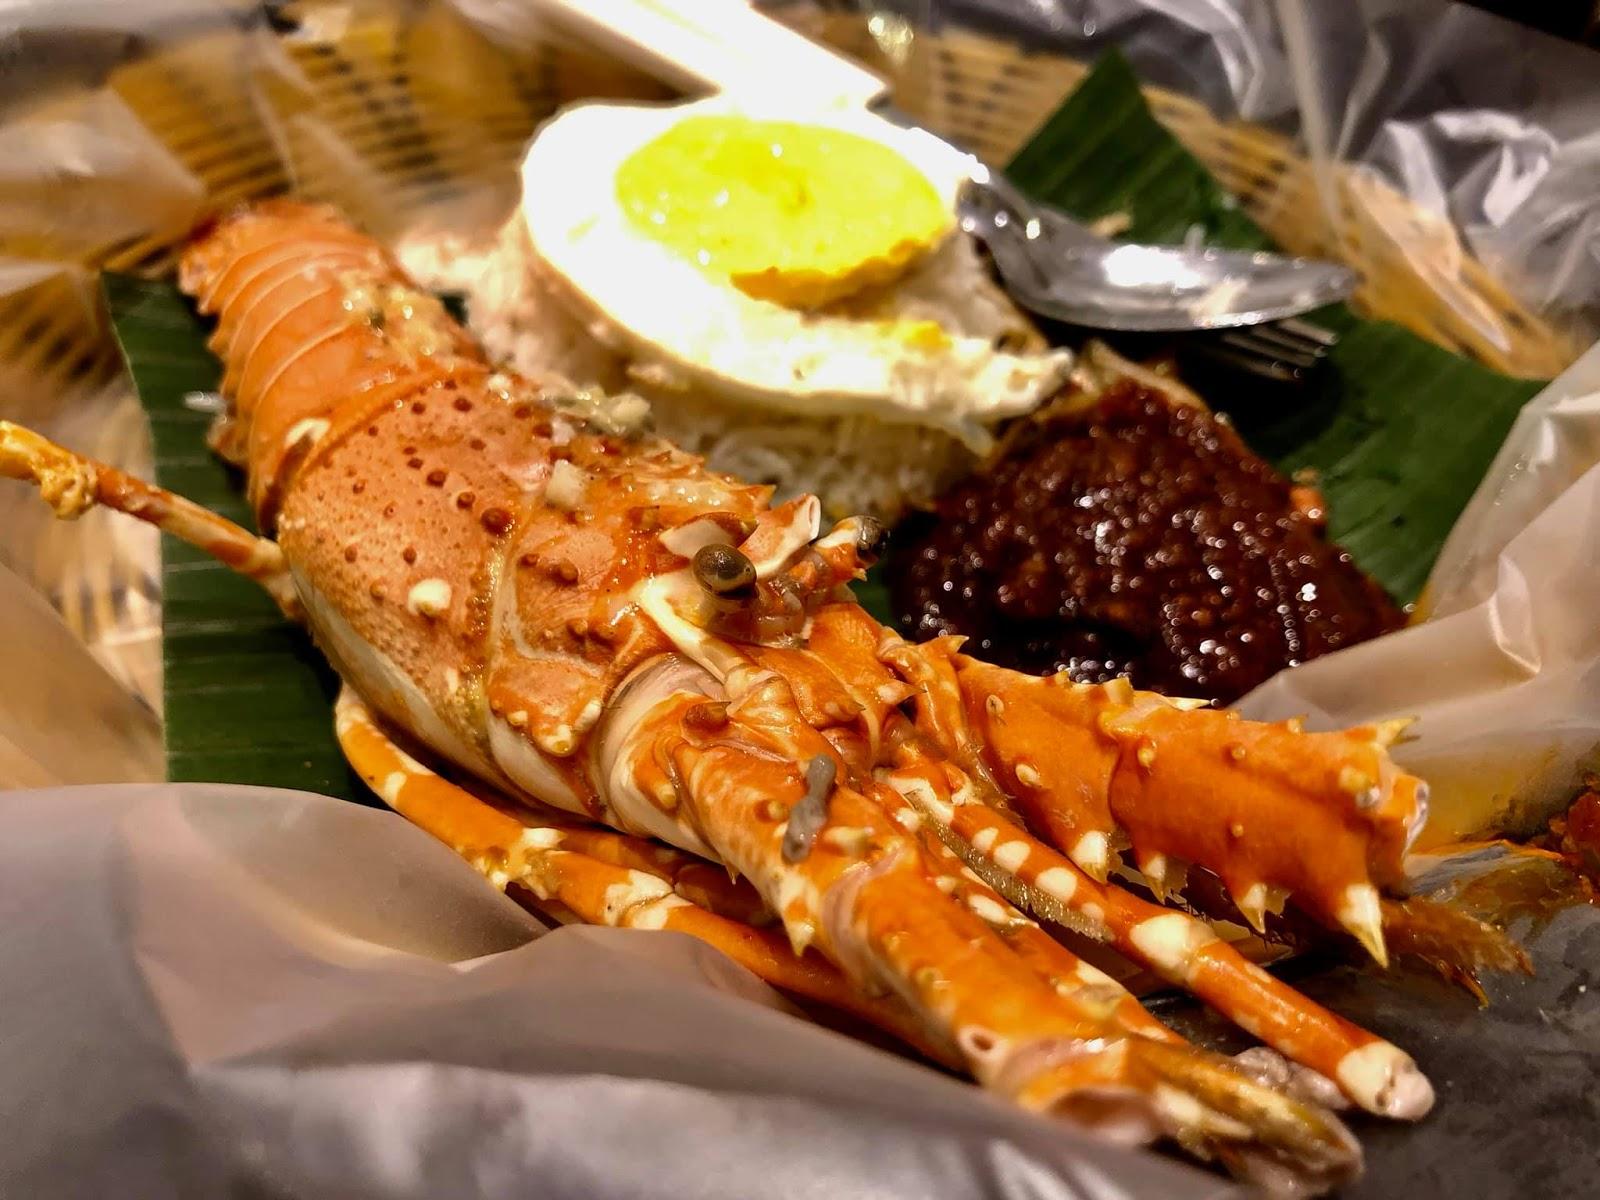 Tempat Makan Sedap Di Johor Nasi Lemak Lobster Jb Aku Sis Lin